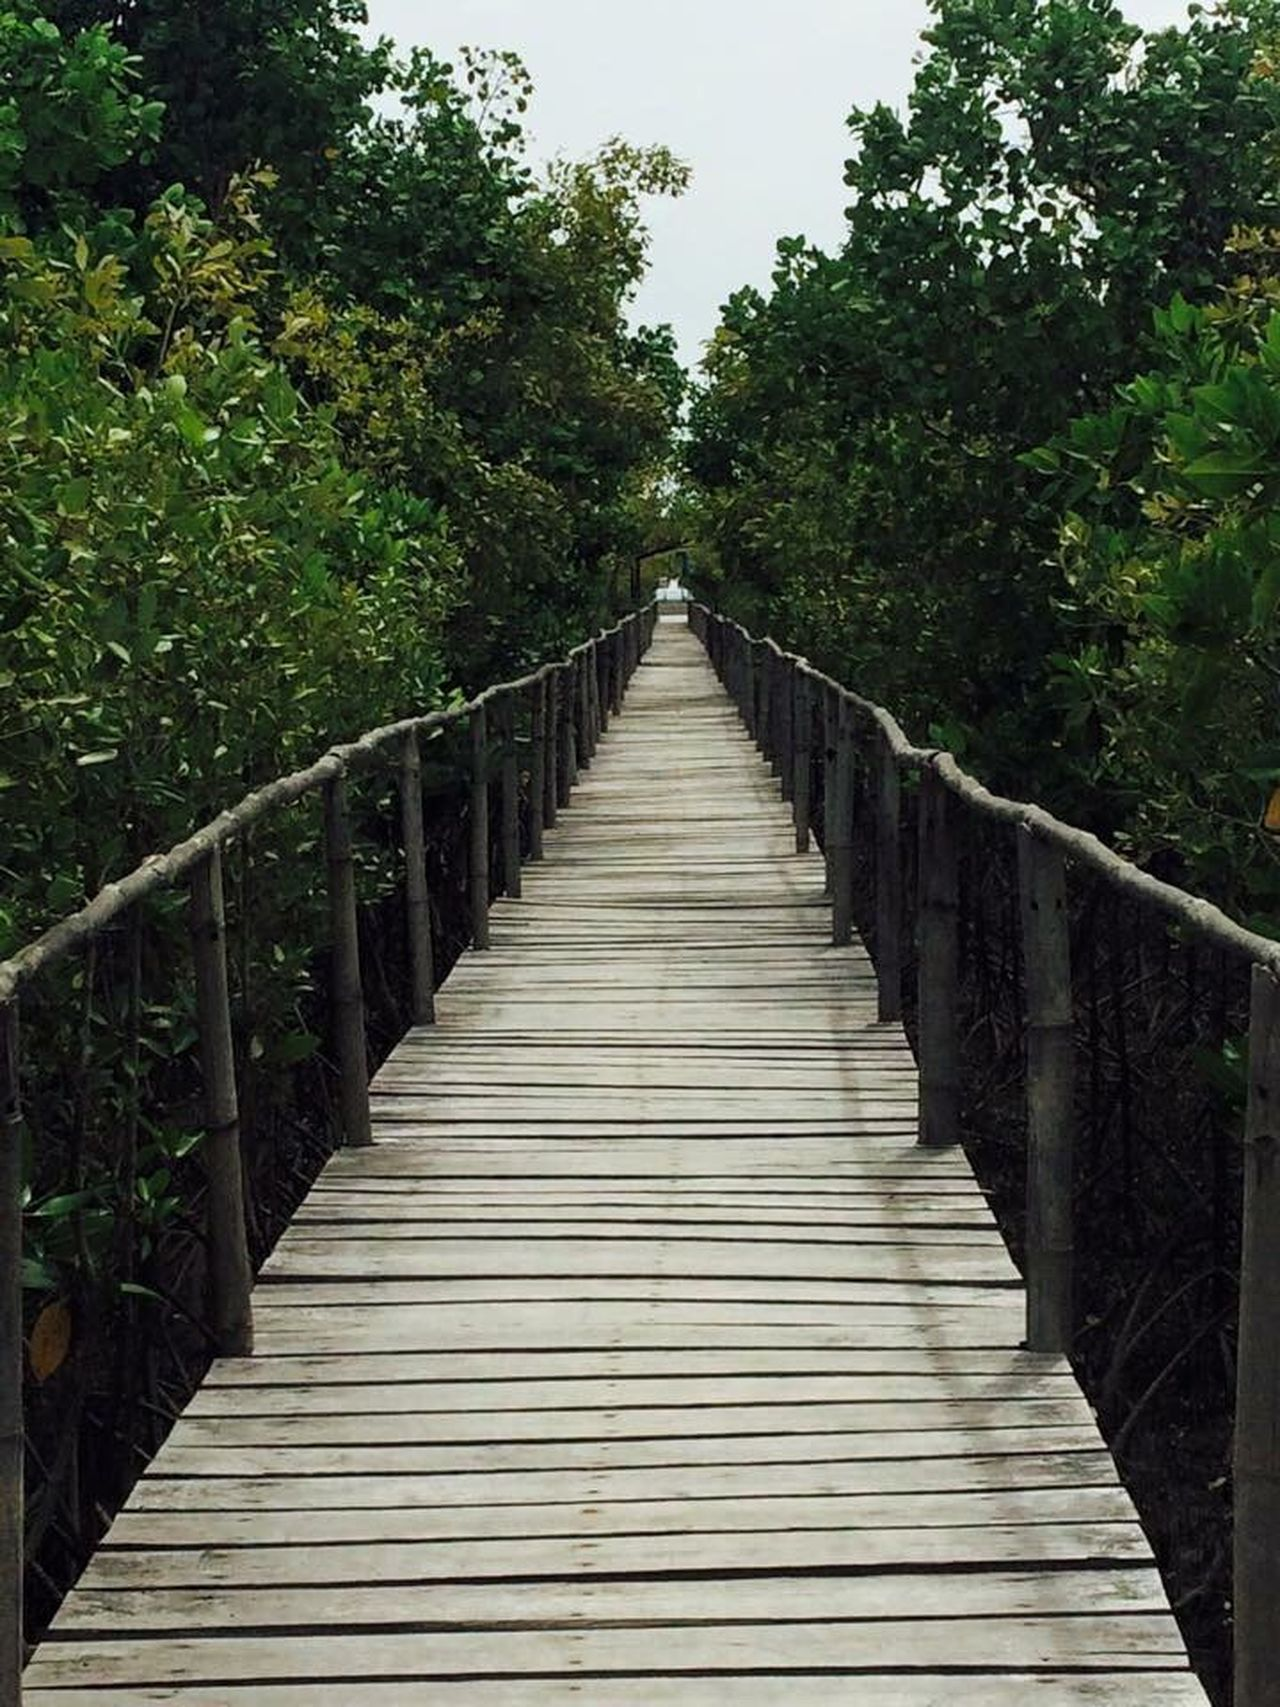 Mangrove park Philippines Tree The Way Forward No People Mangroves EyeEmNewHere